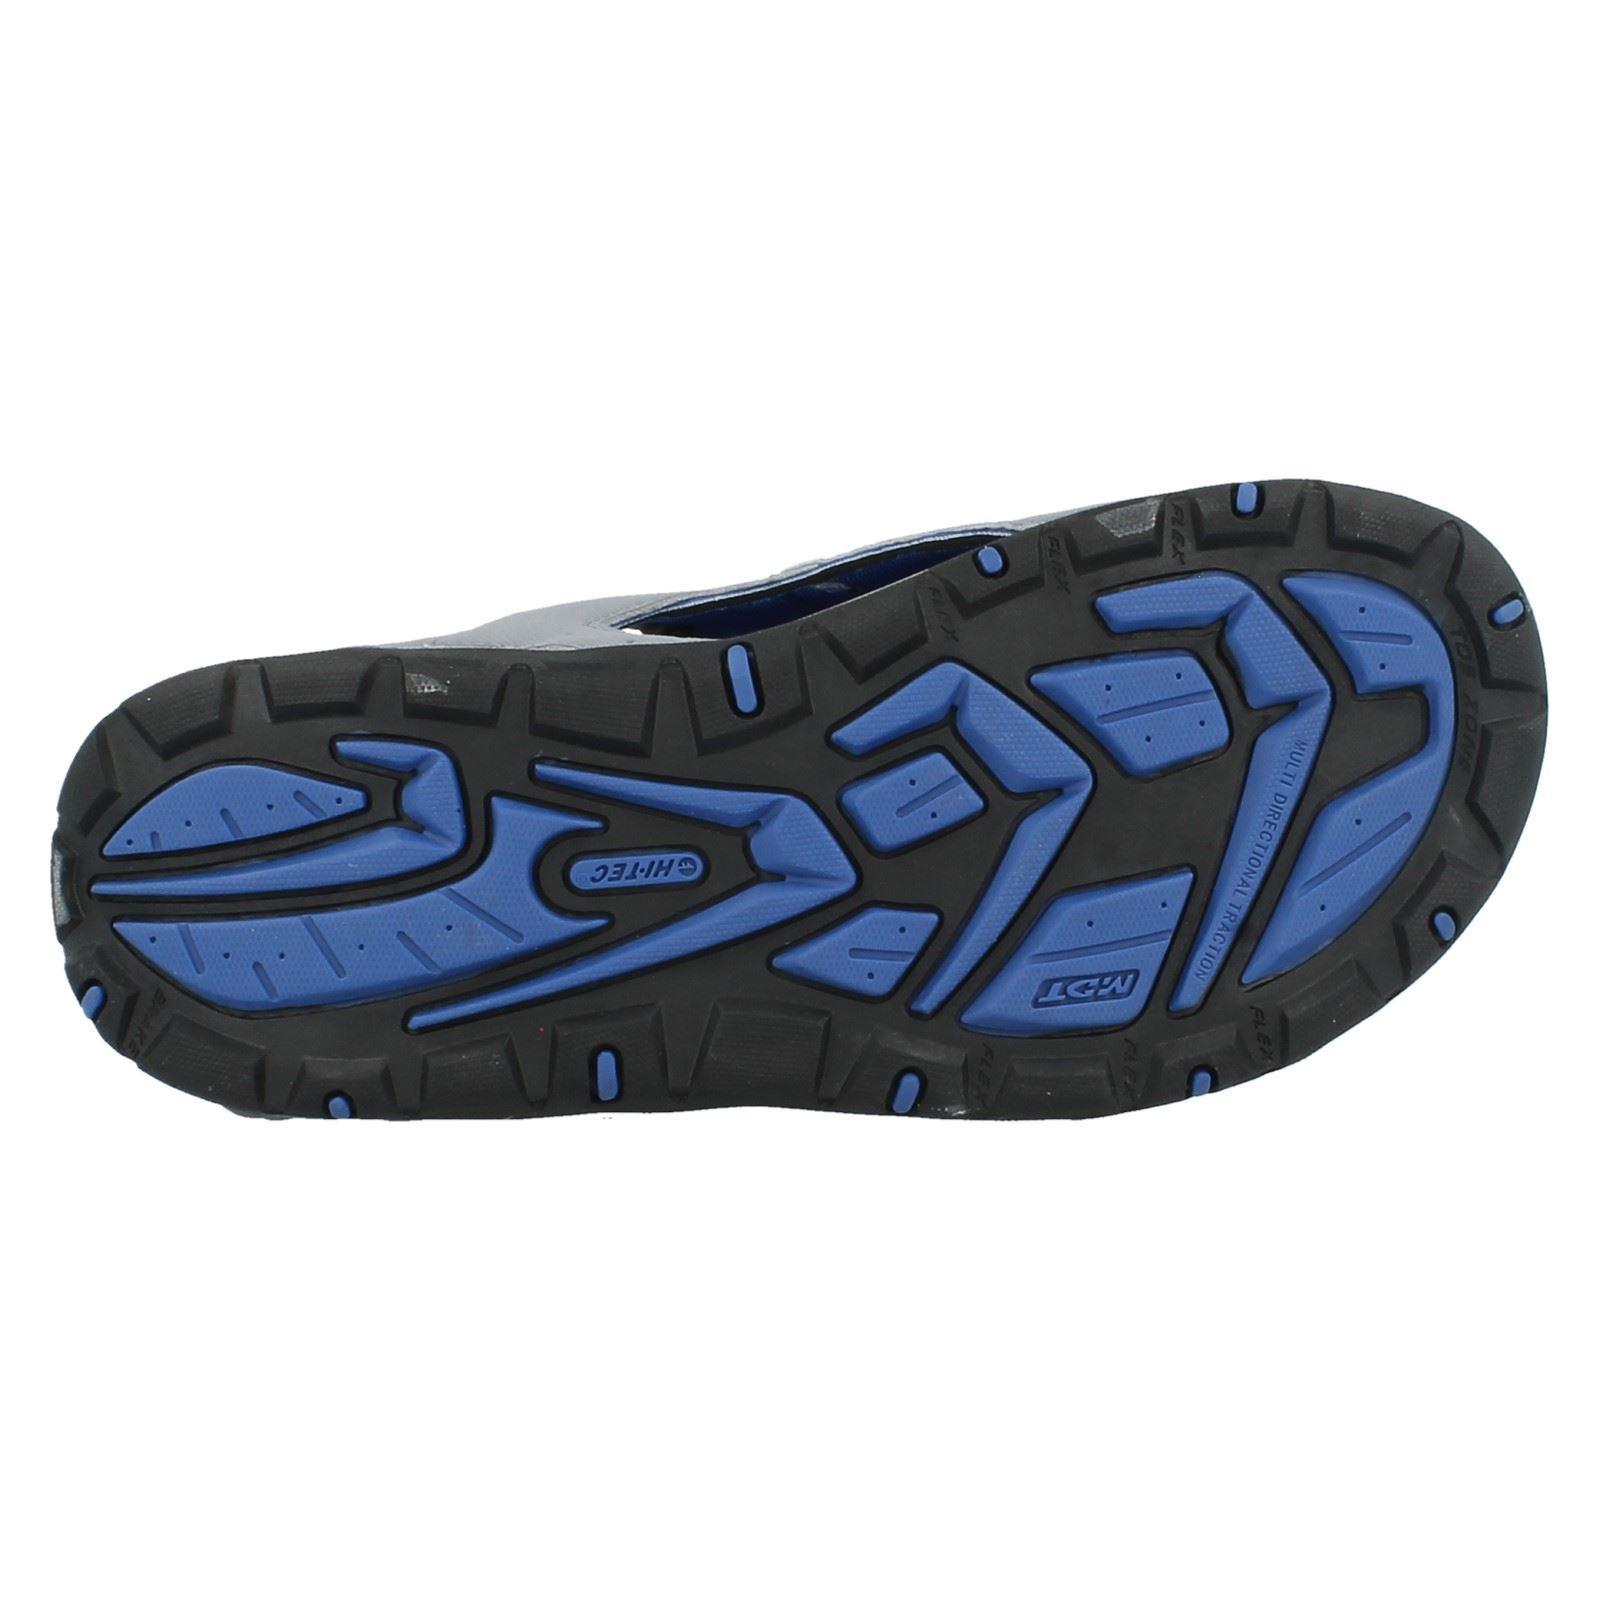 'Boys Hi-Tec' Sandals - Turtle Beach JR